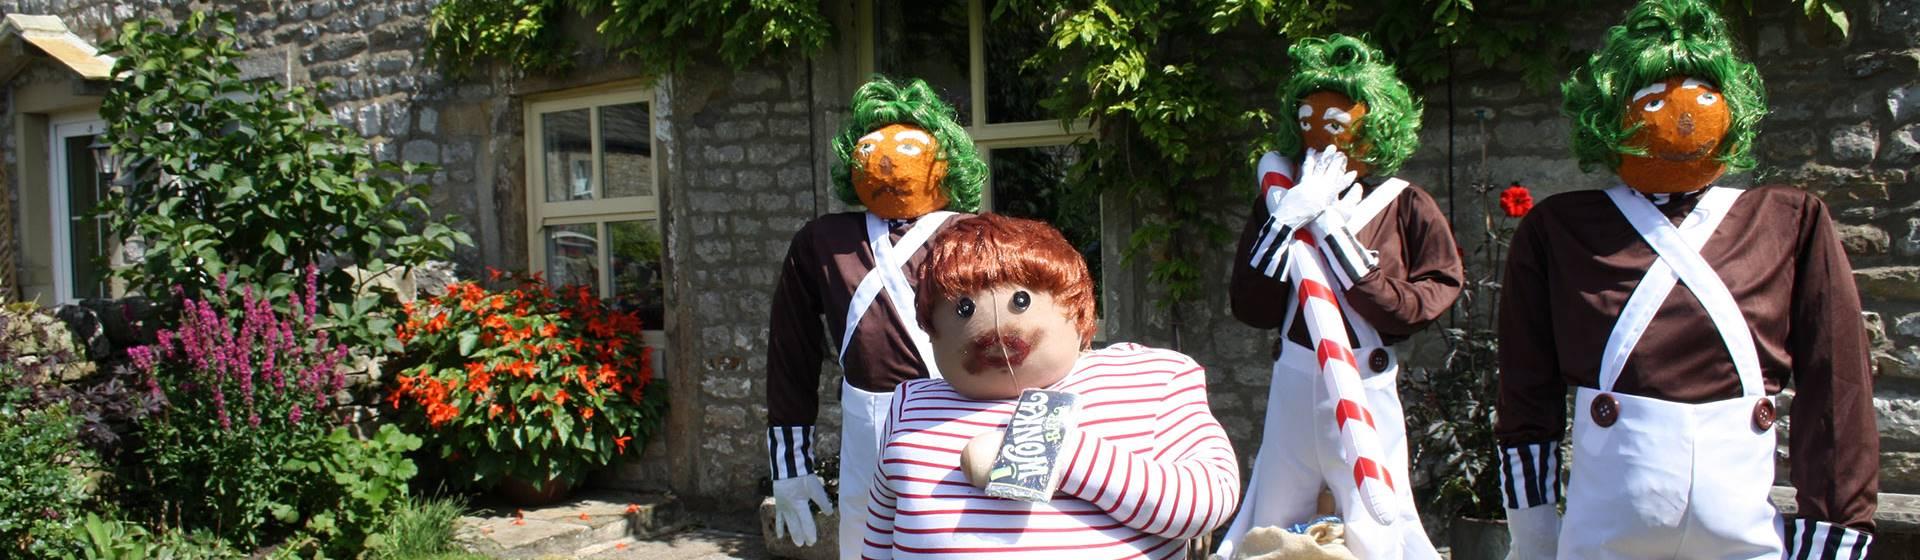 Yorkshire Scarecrow Festival